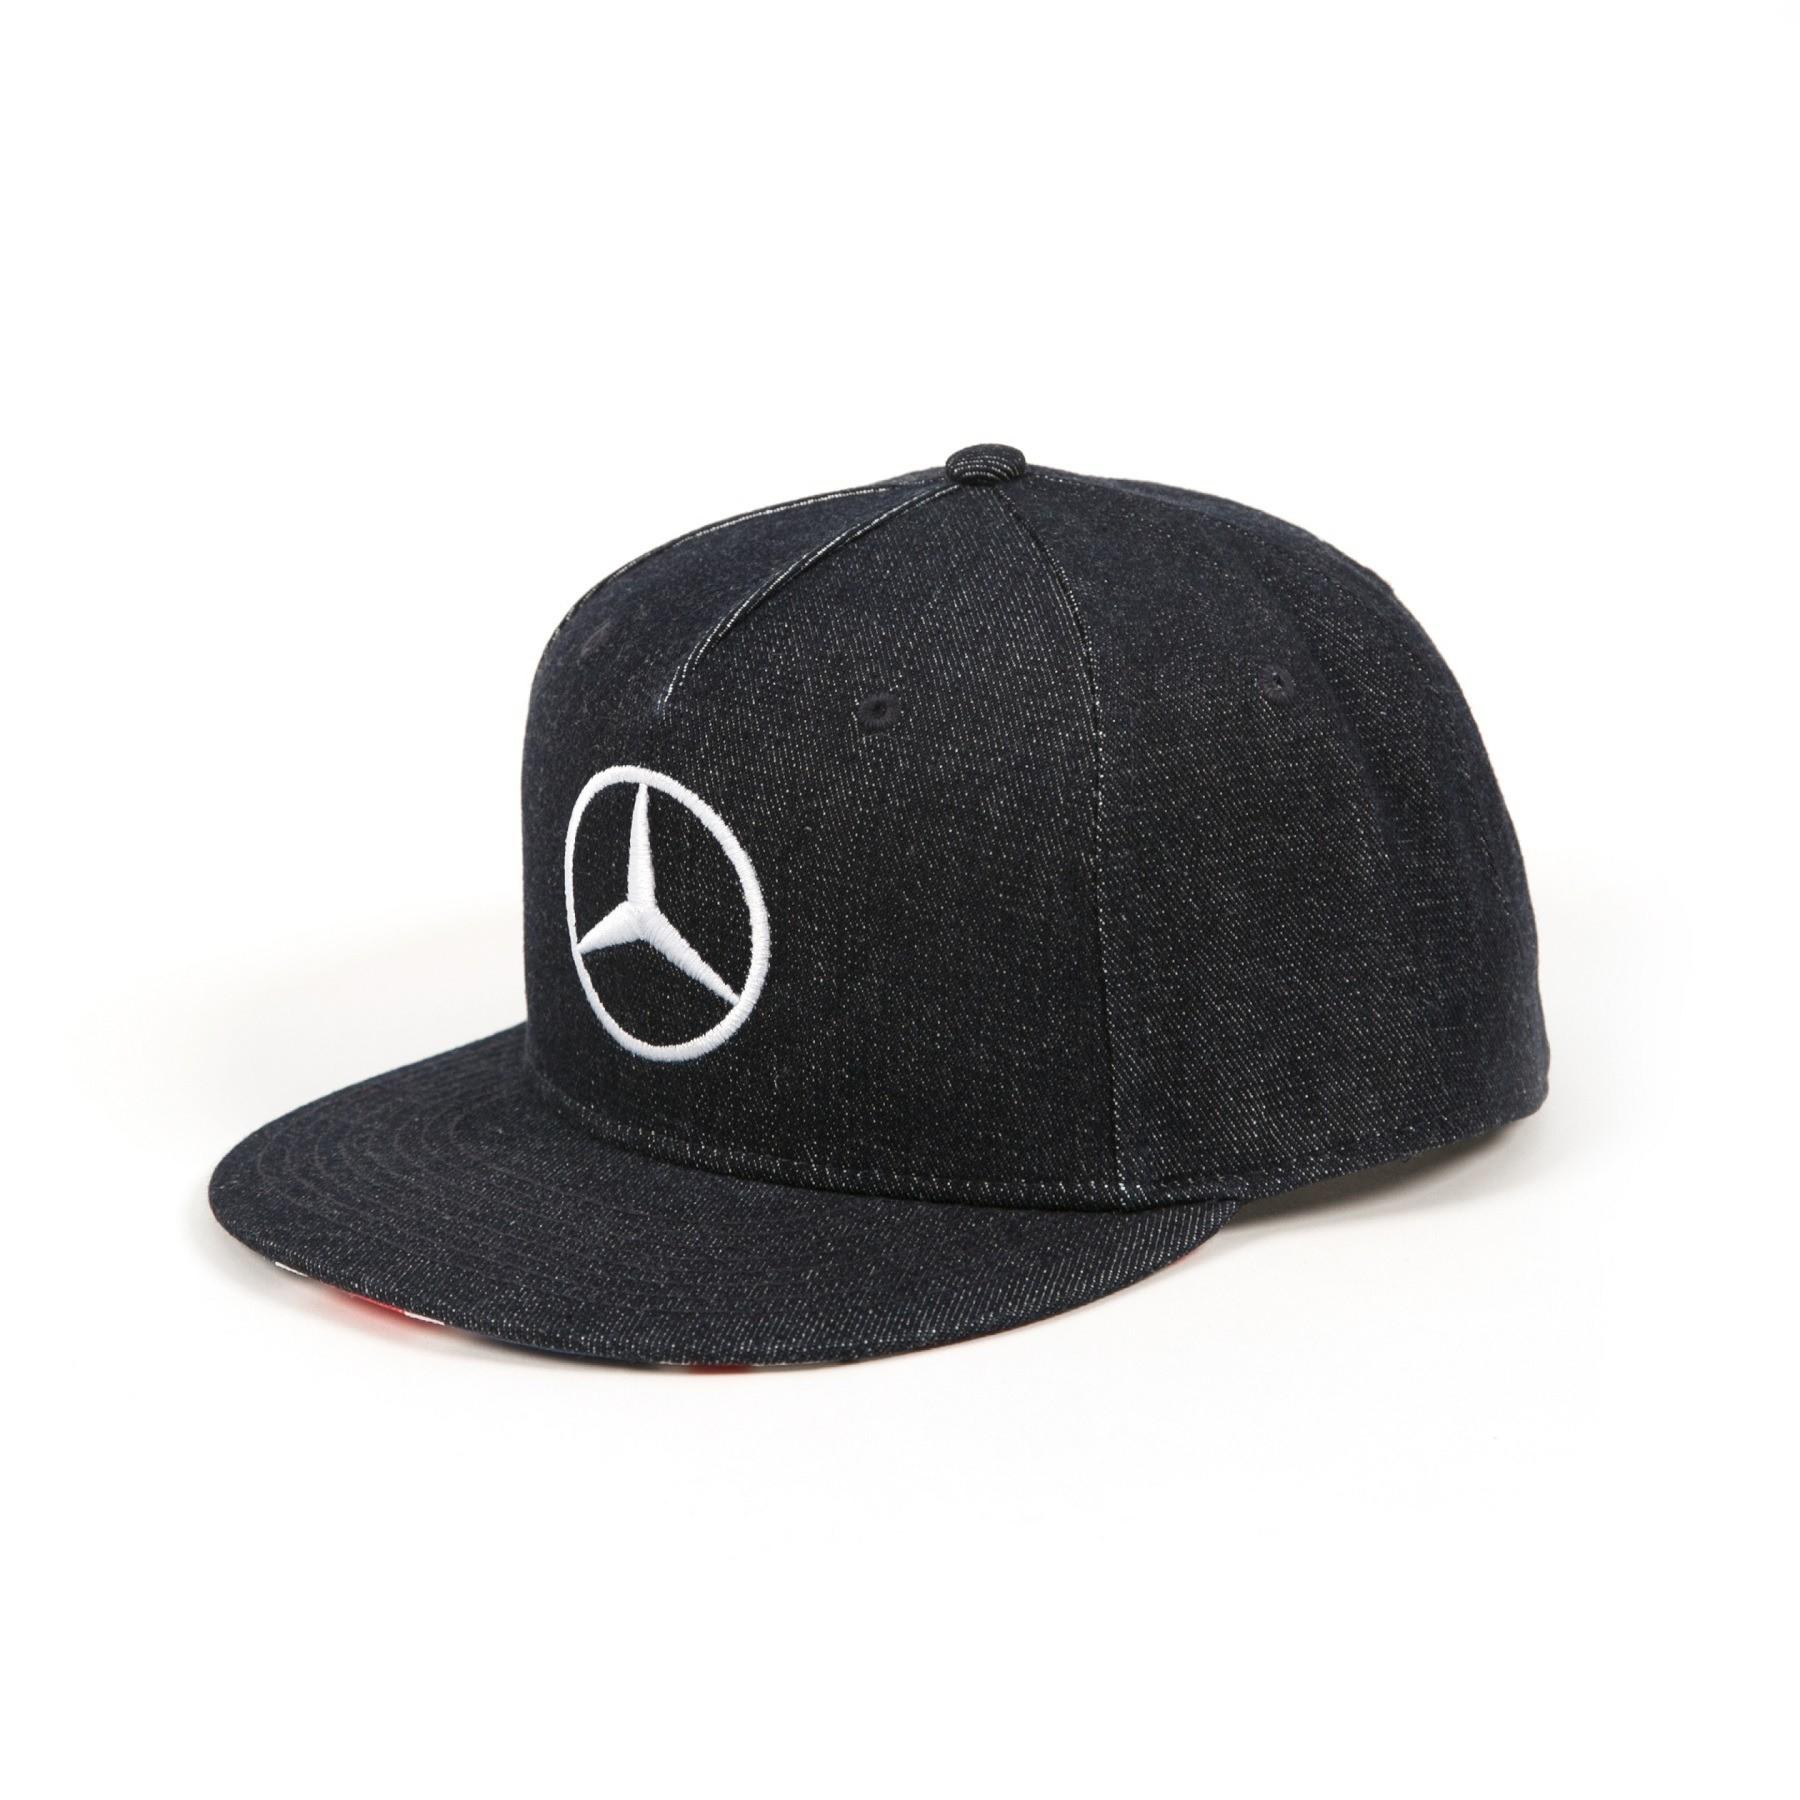 Lewis Hamilton Silverstone Cap Blue 2017 F1 British Grand Prix Special Edition Ebay